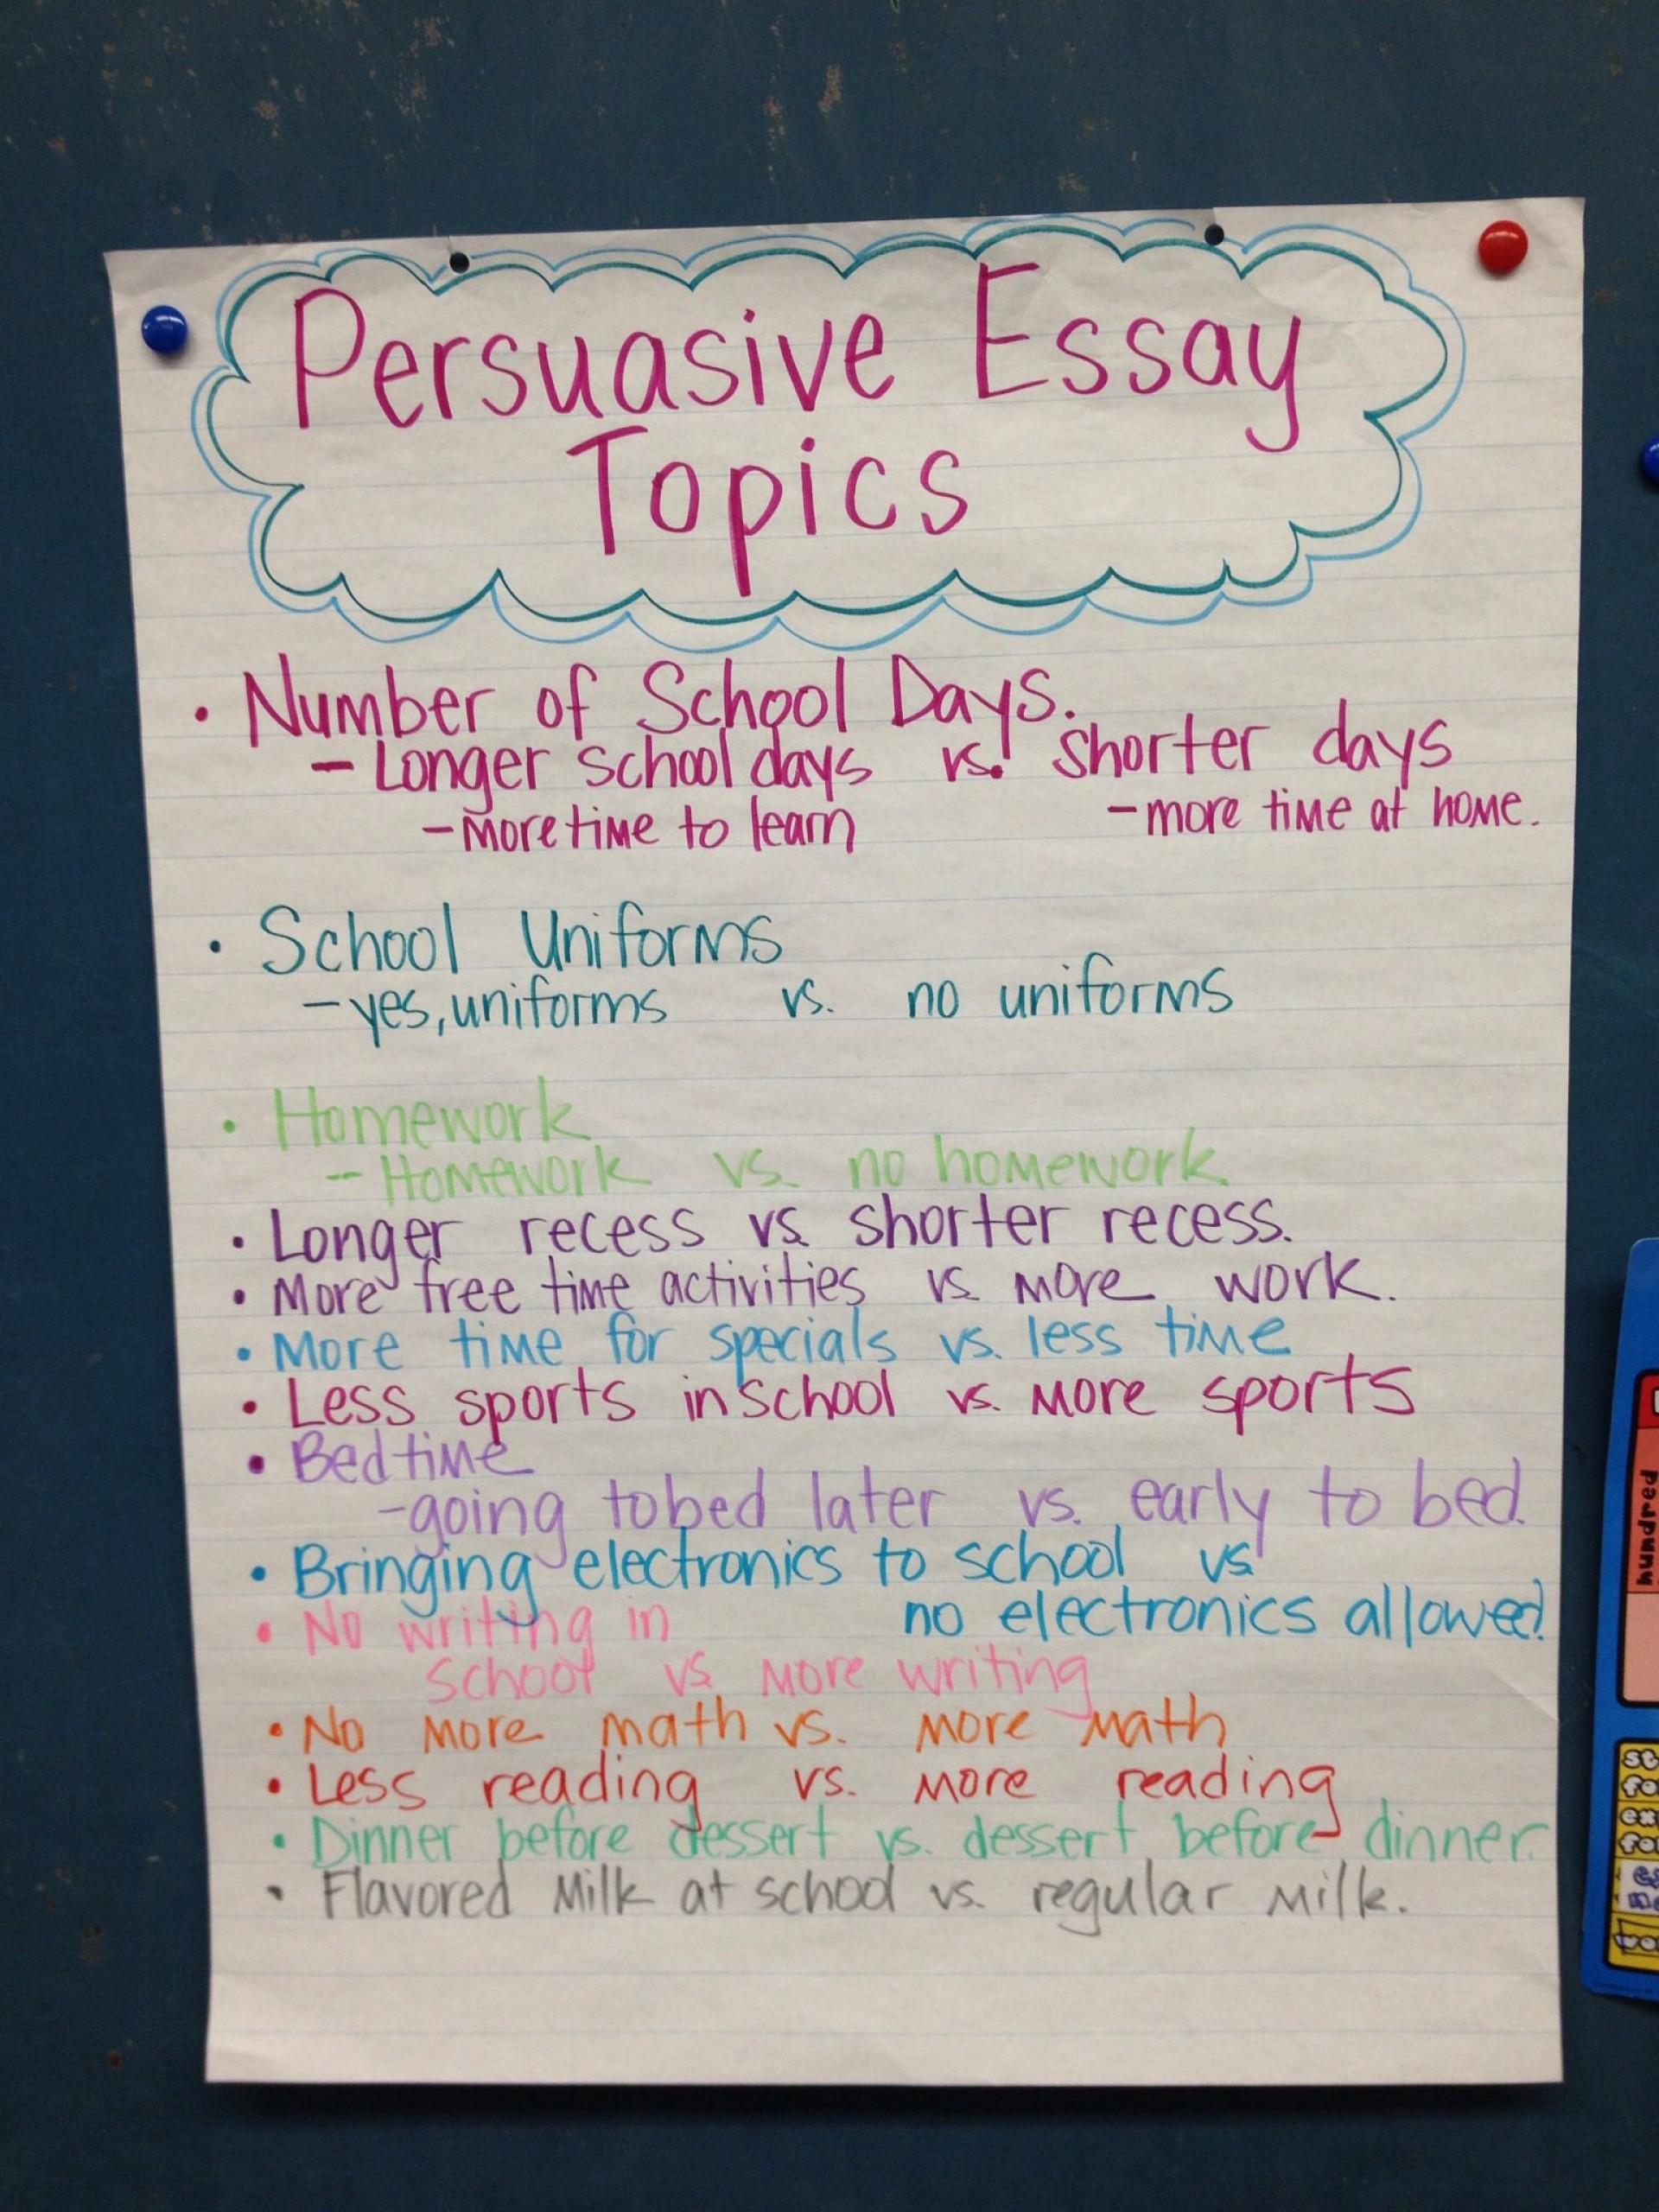 013 Good Persuasive Essay Topics Example Amazing 2018 Uk Argumentative High School 1920